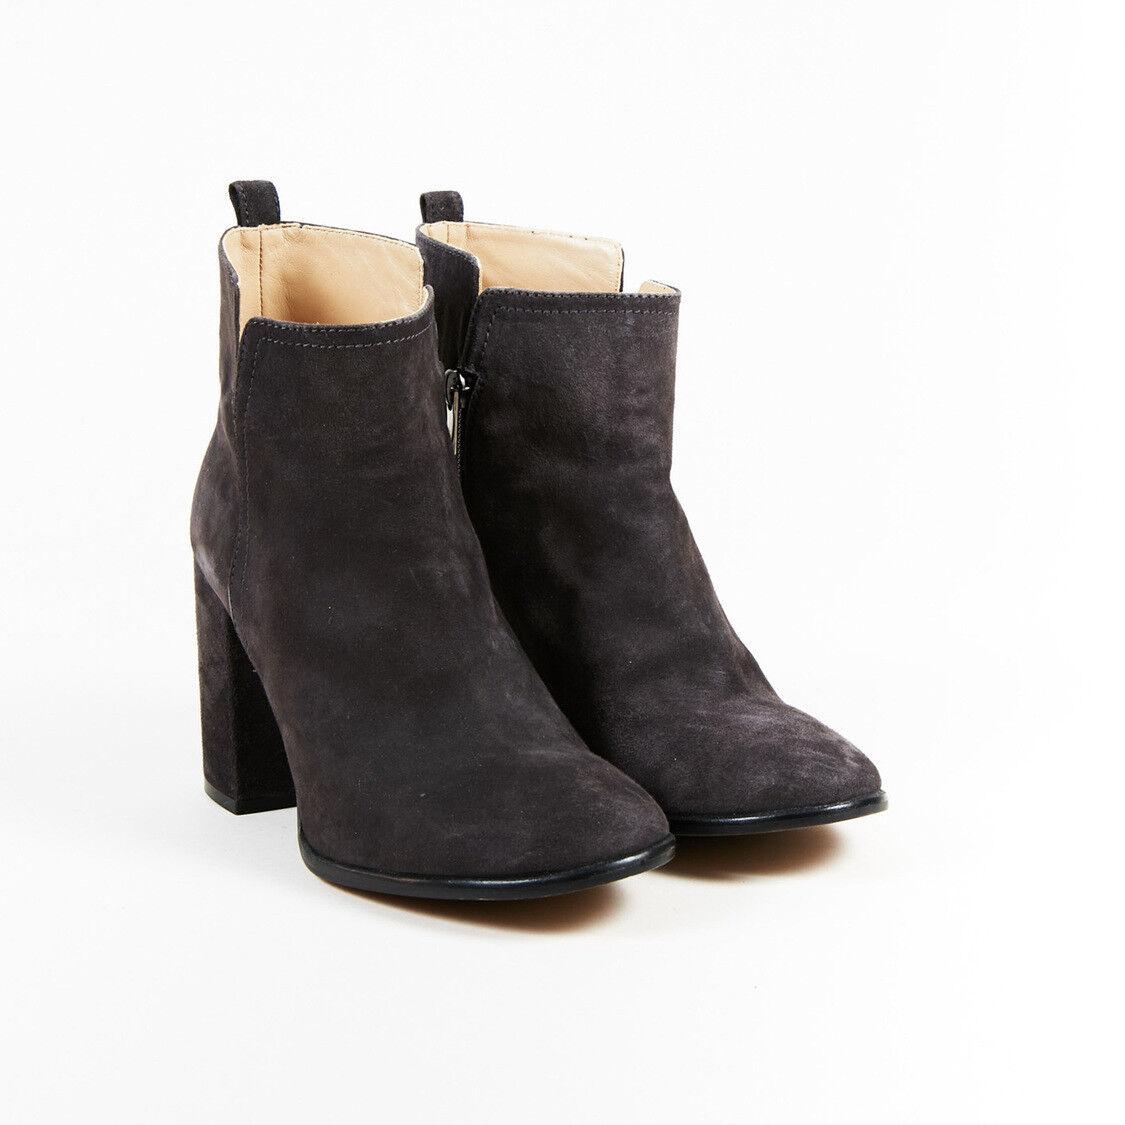 Pura Lopez  Gray Suede Zipped Block Heel Platform Ankle Stiefel SZ 39